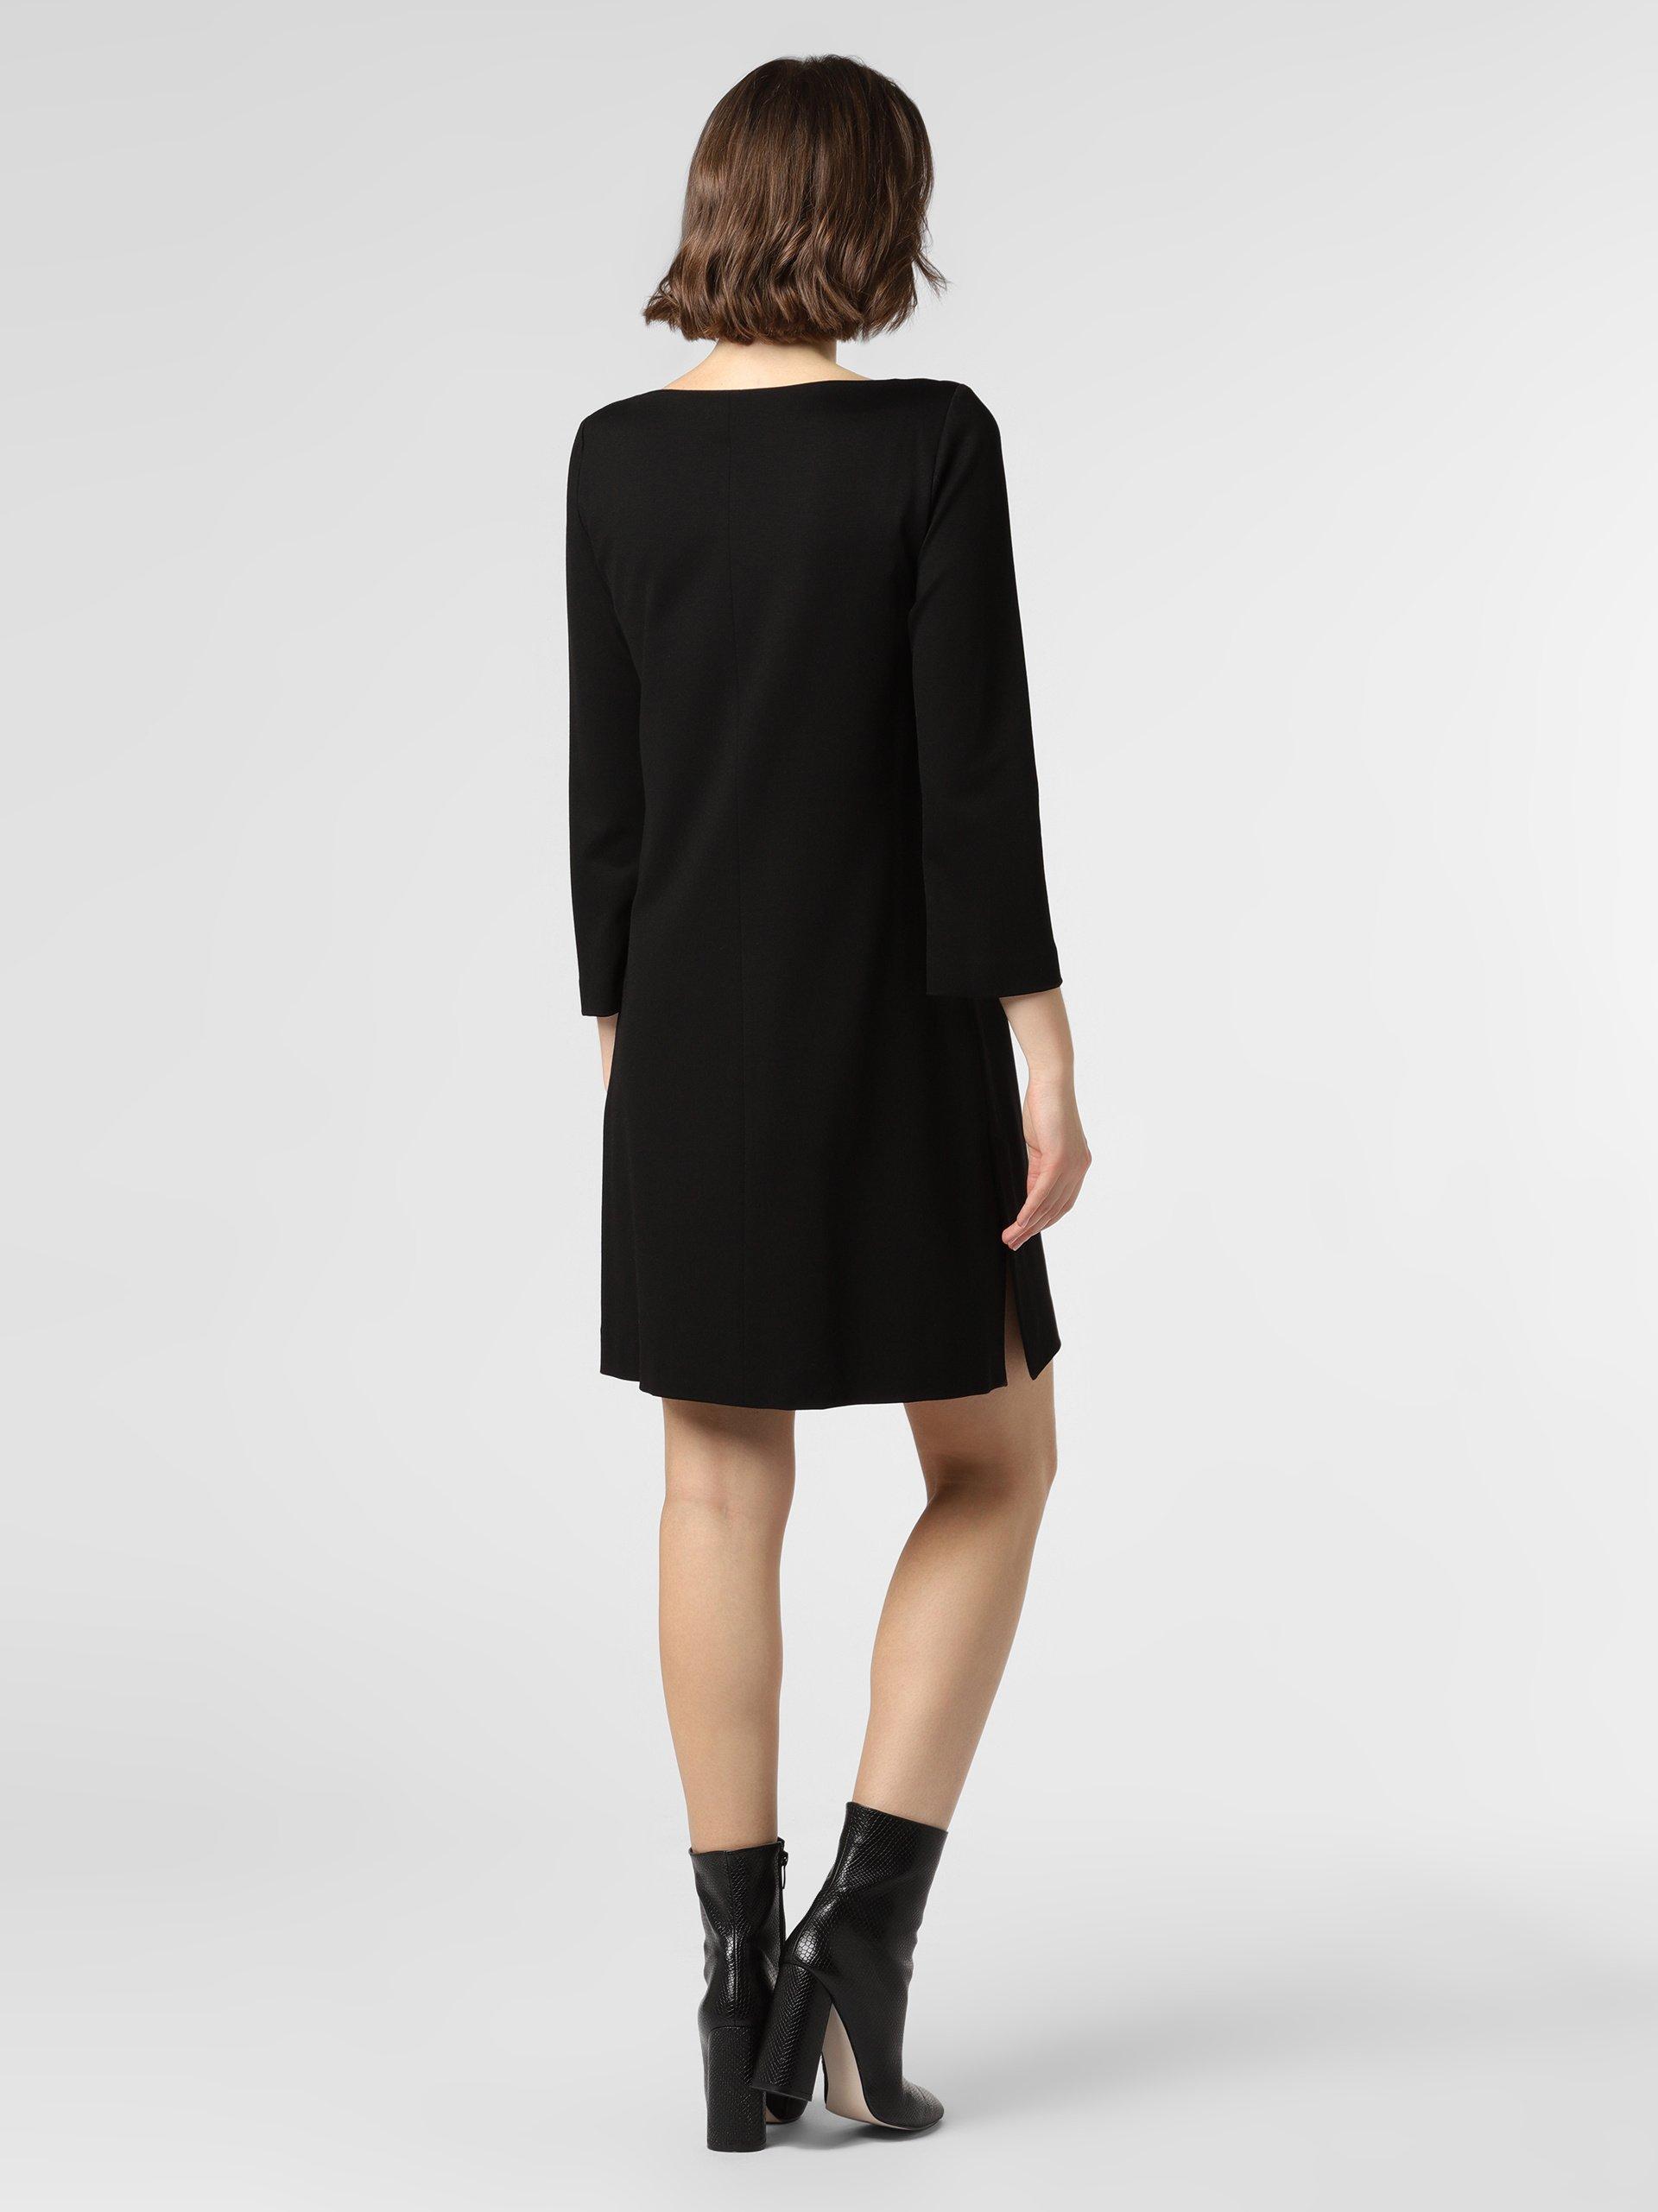 Marc Cain Essentials Damen Kleid